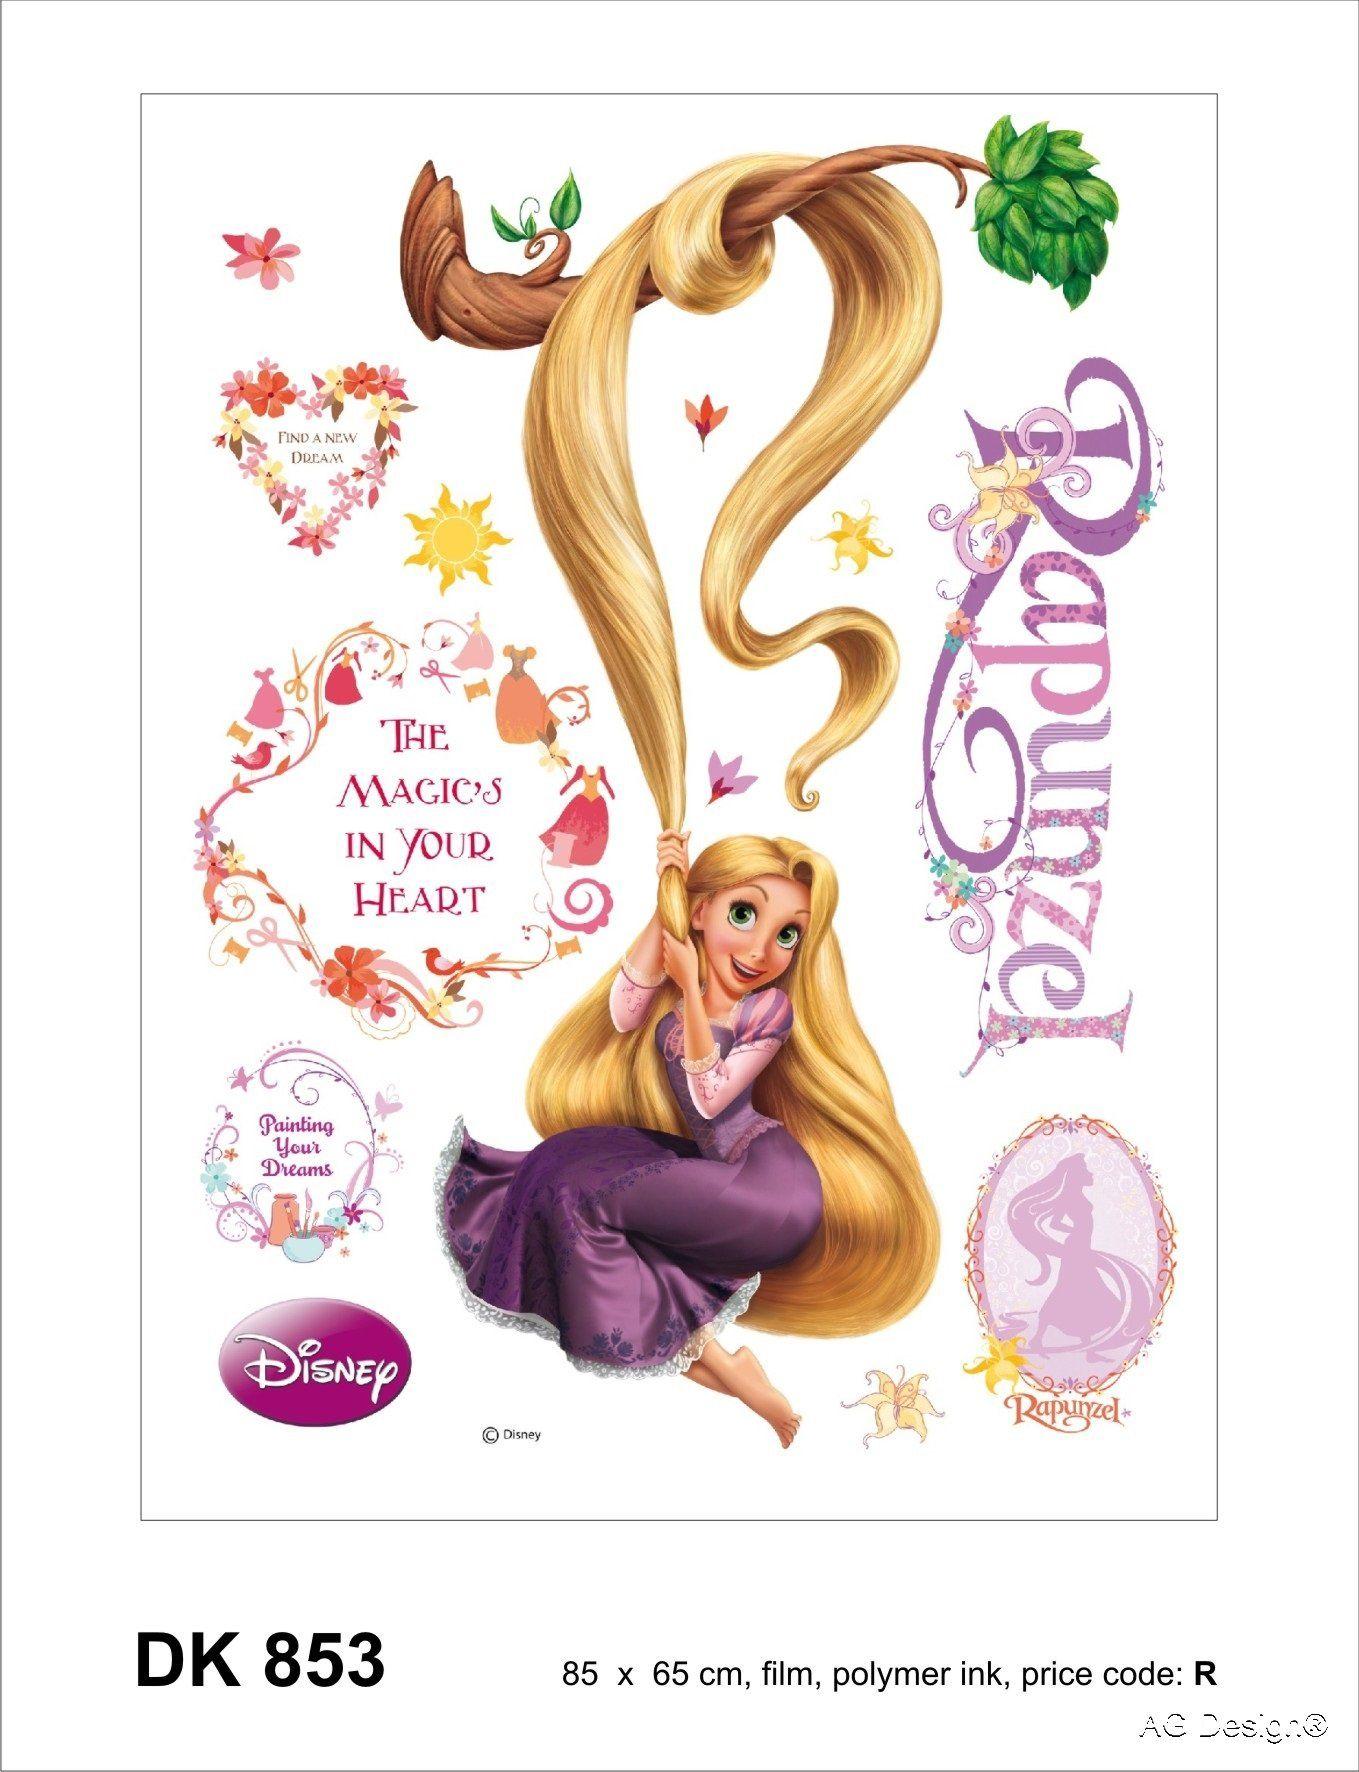 Naklejka ścienna DK 853 Disney Rapunzel